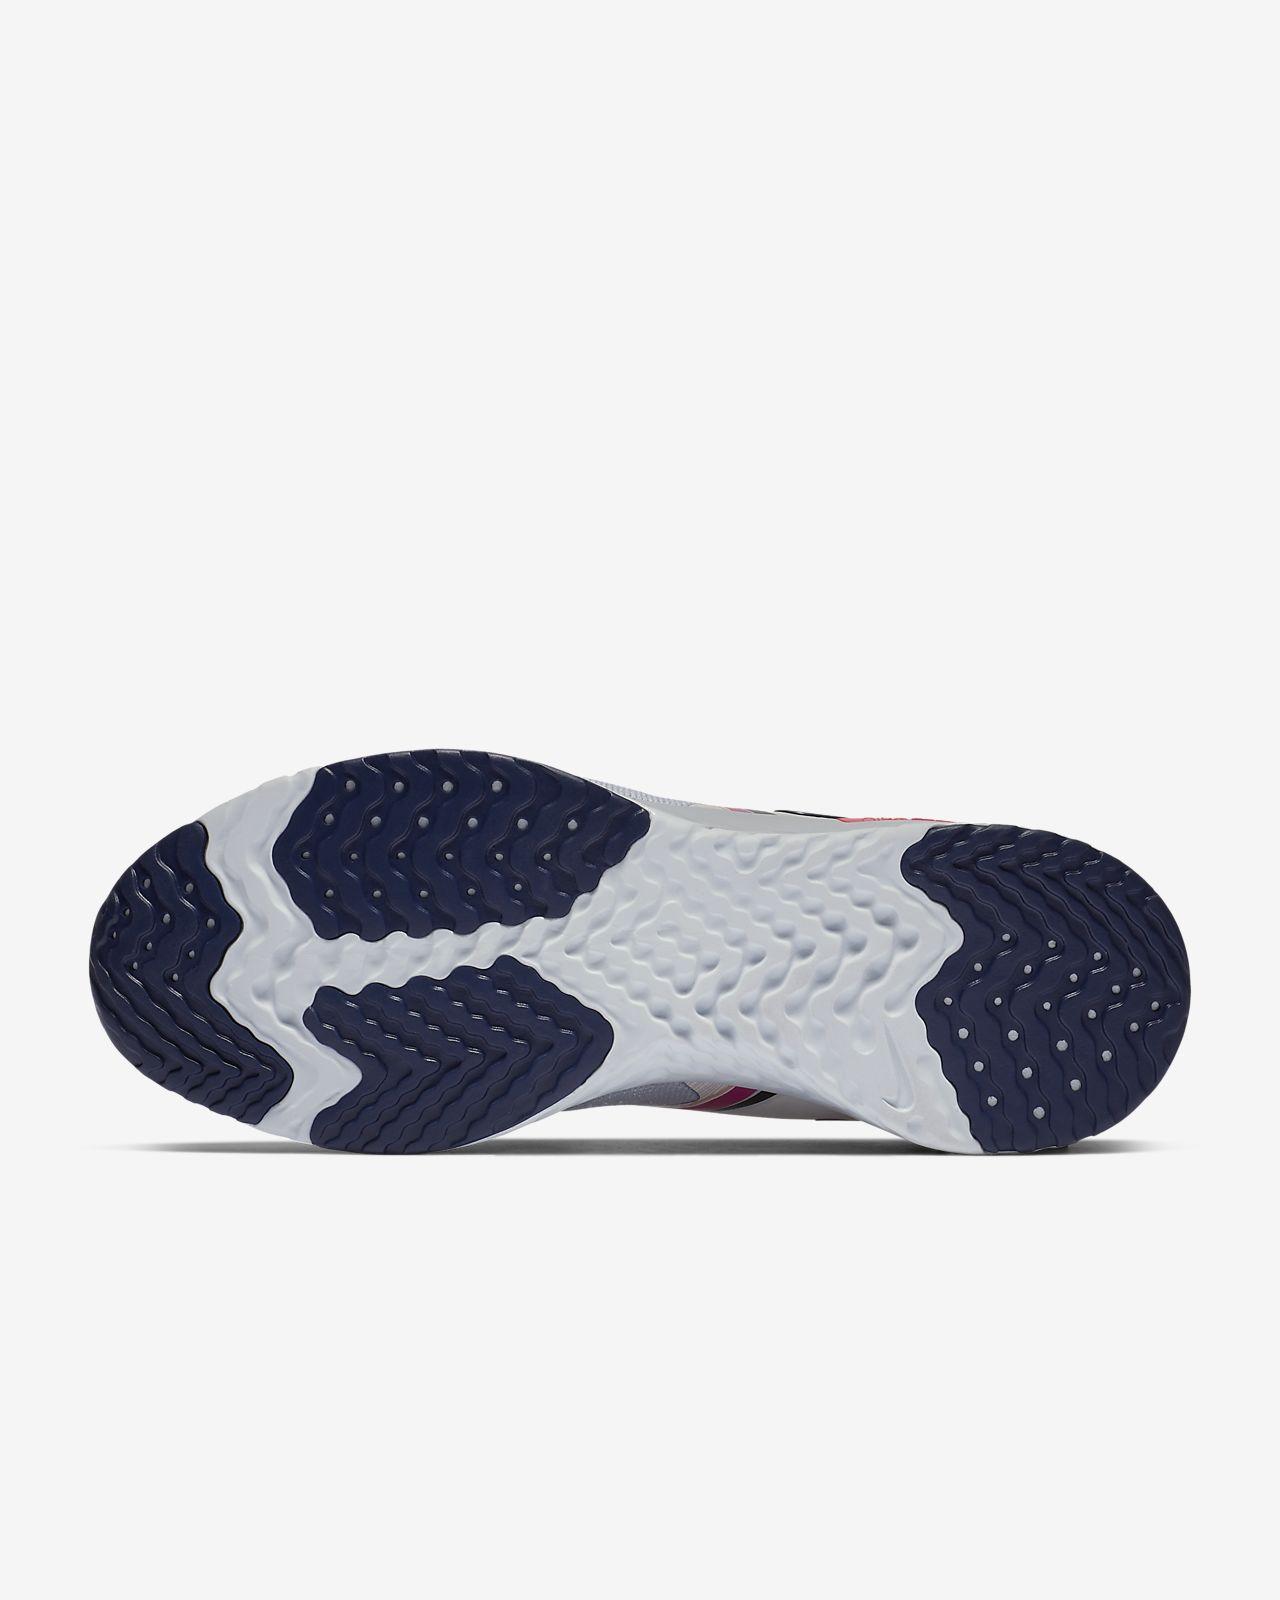 646c7dbea726 http   entitle.kermancinema.com crab vxiti-Nike Running amp ...